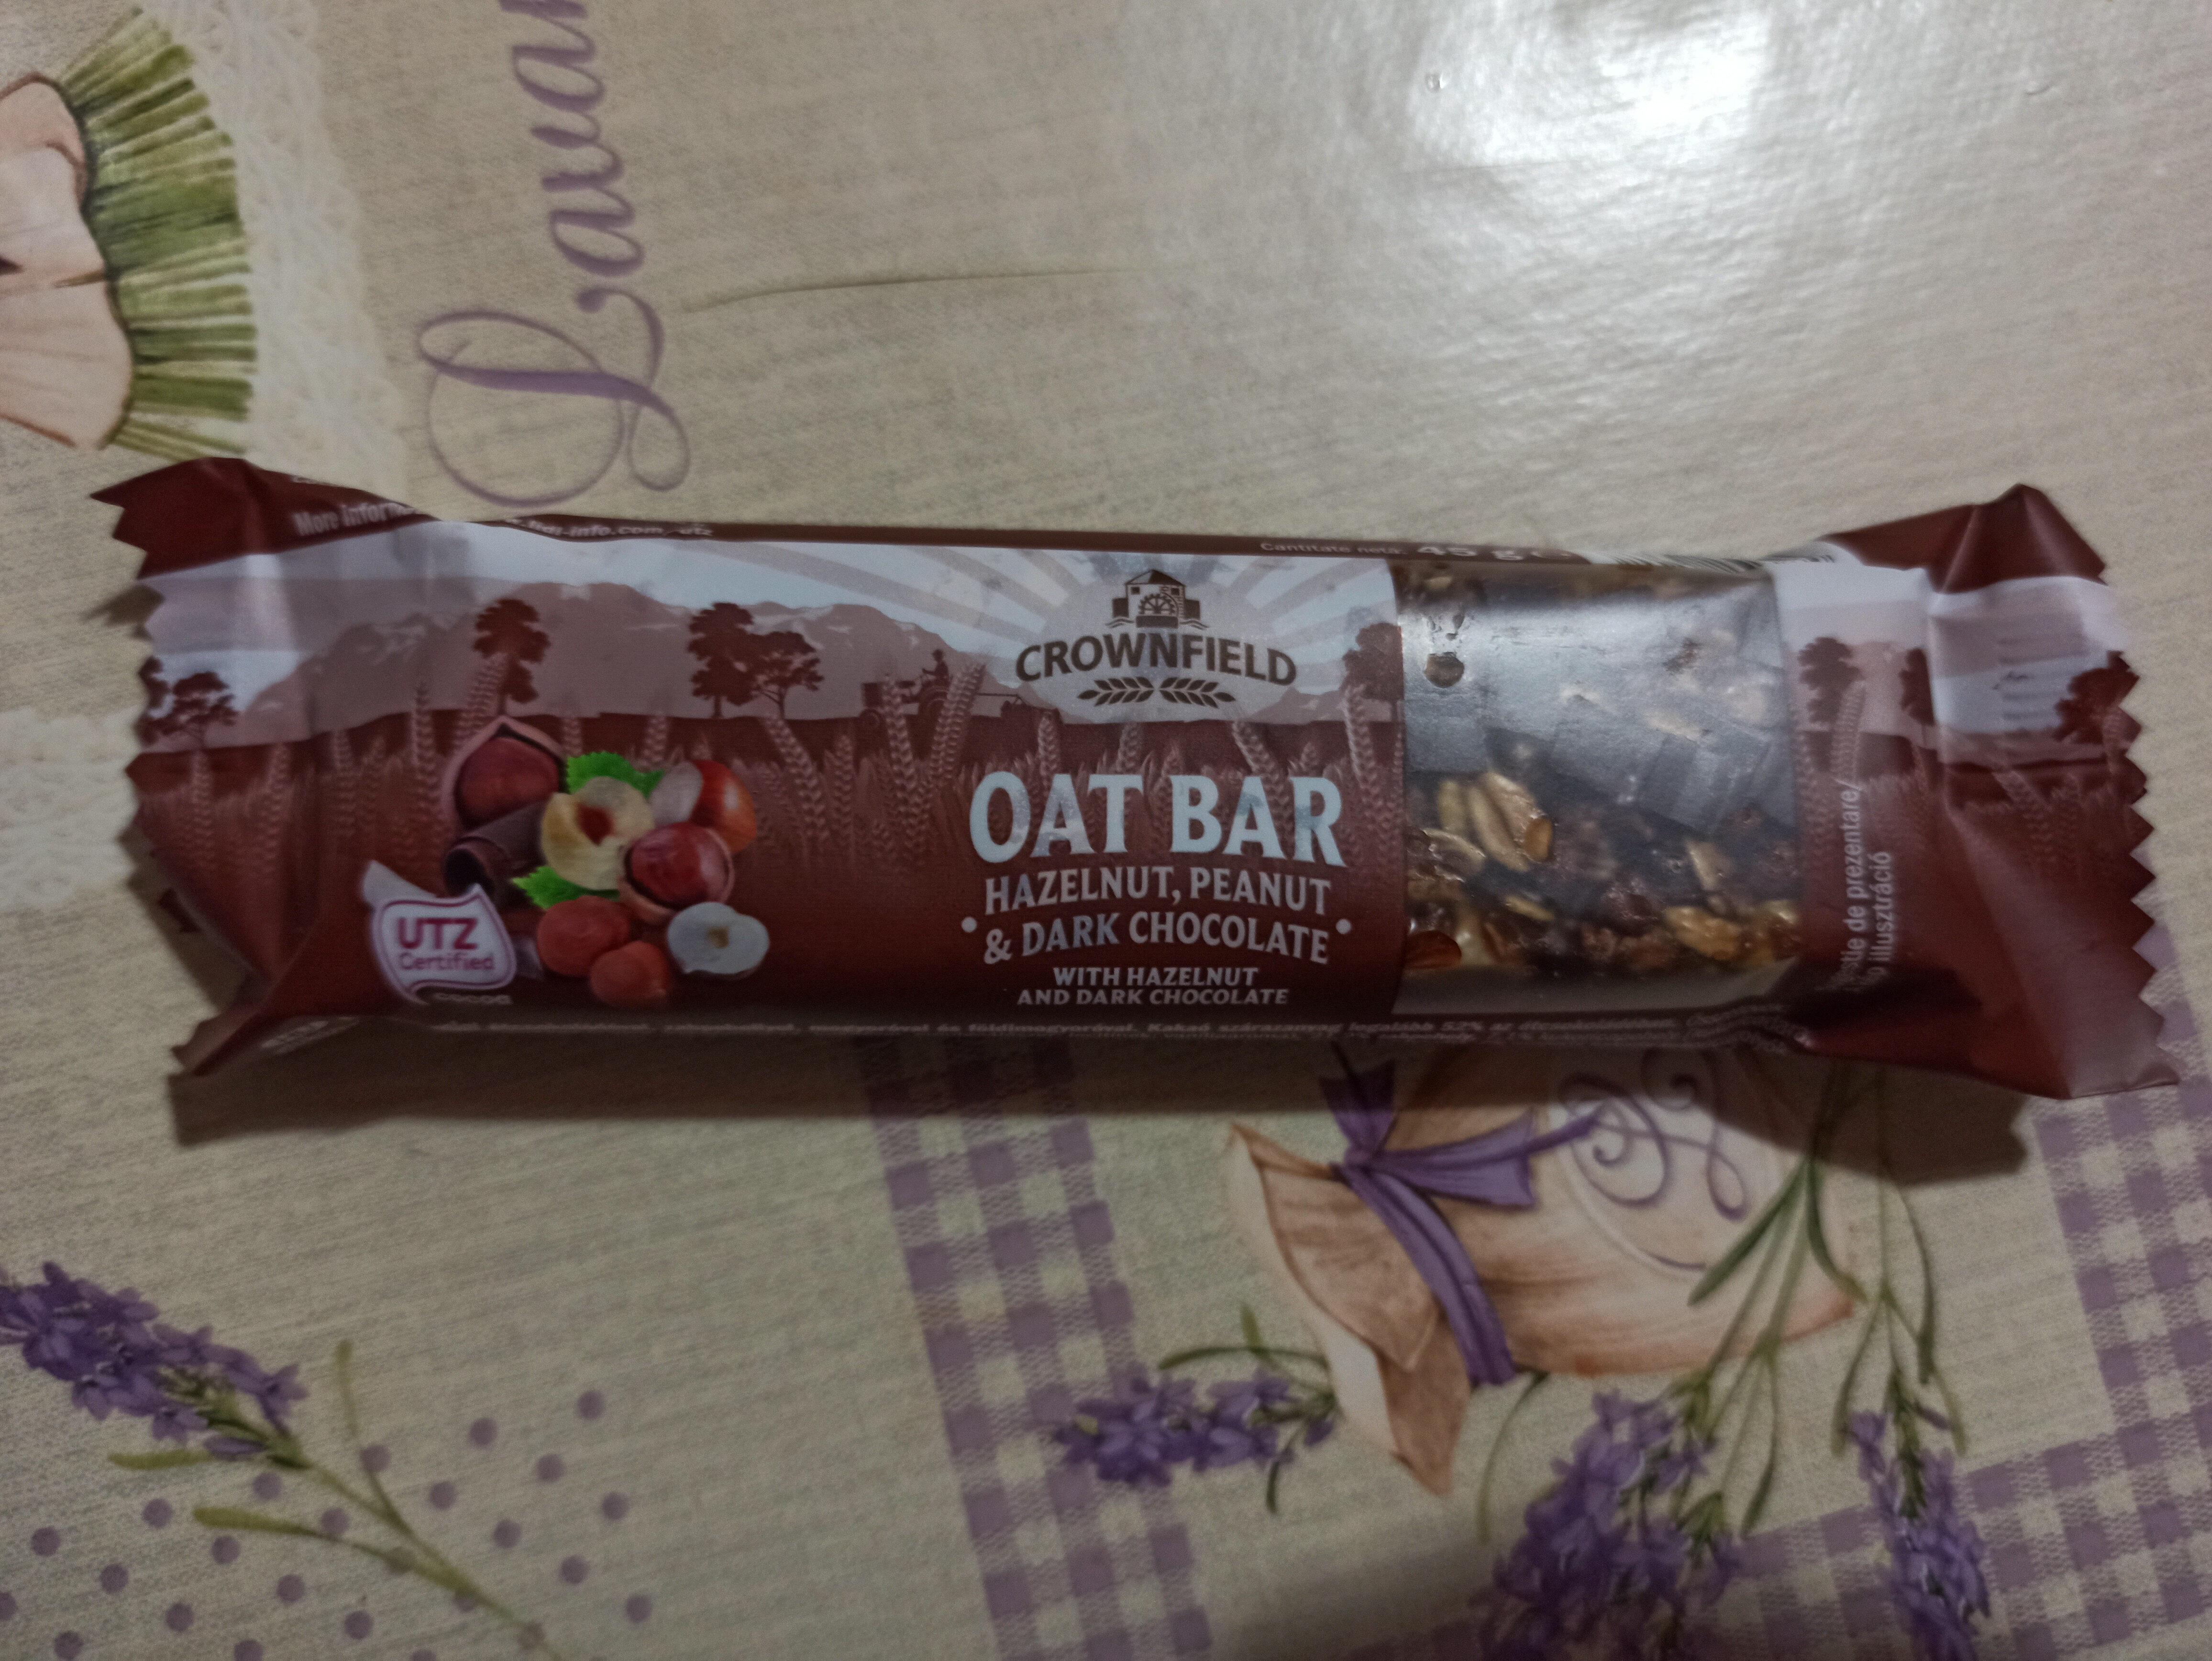 Crownfield Oat Bar Hazelnut, Peanut & Dark Chocolate - Produit - ro